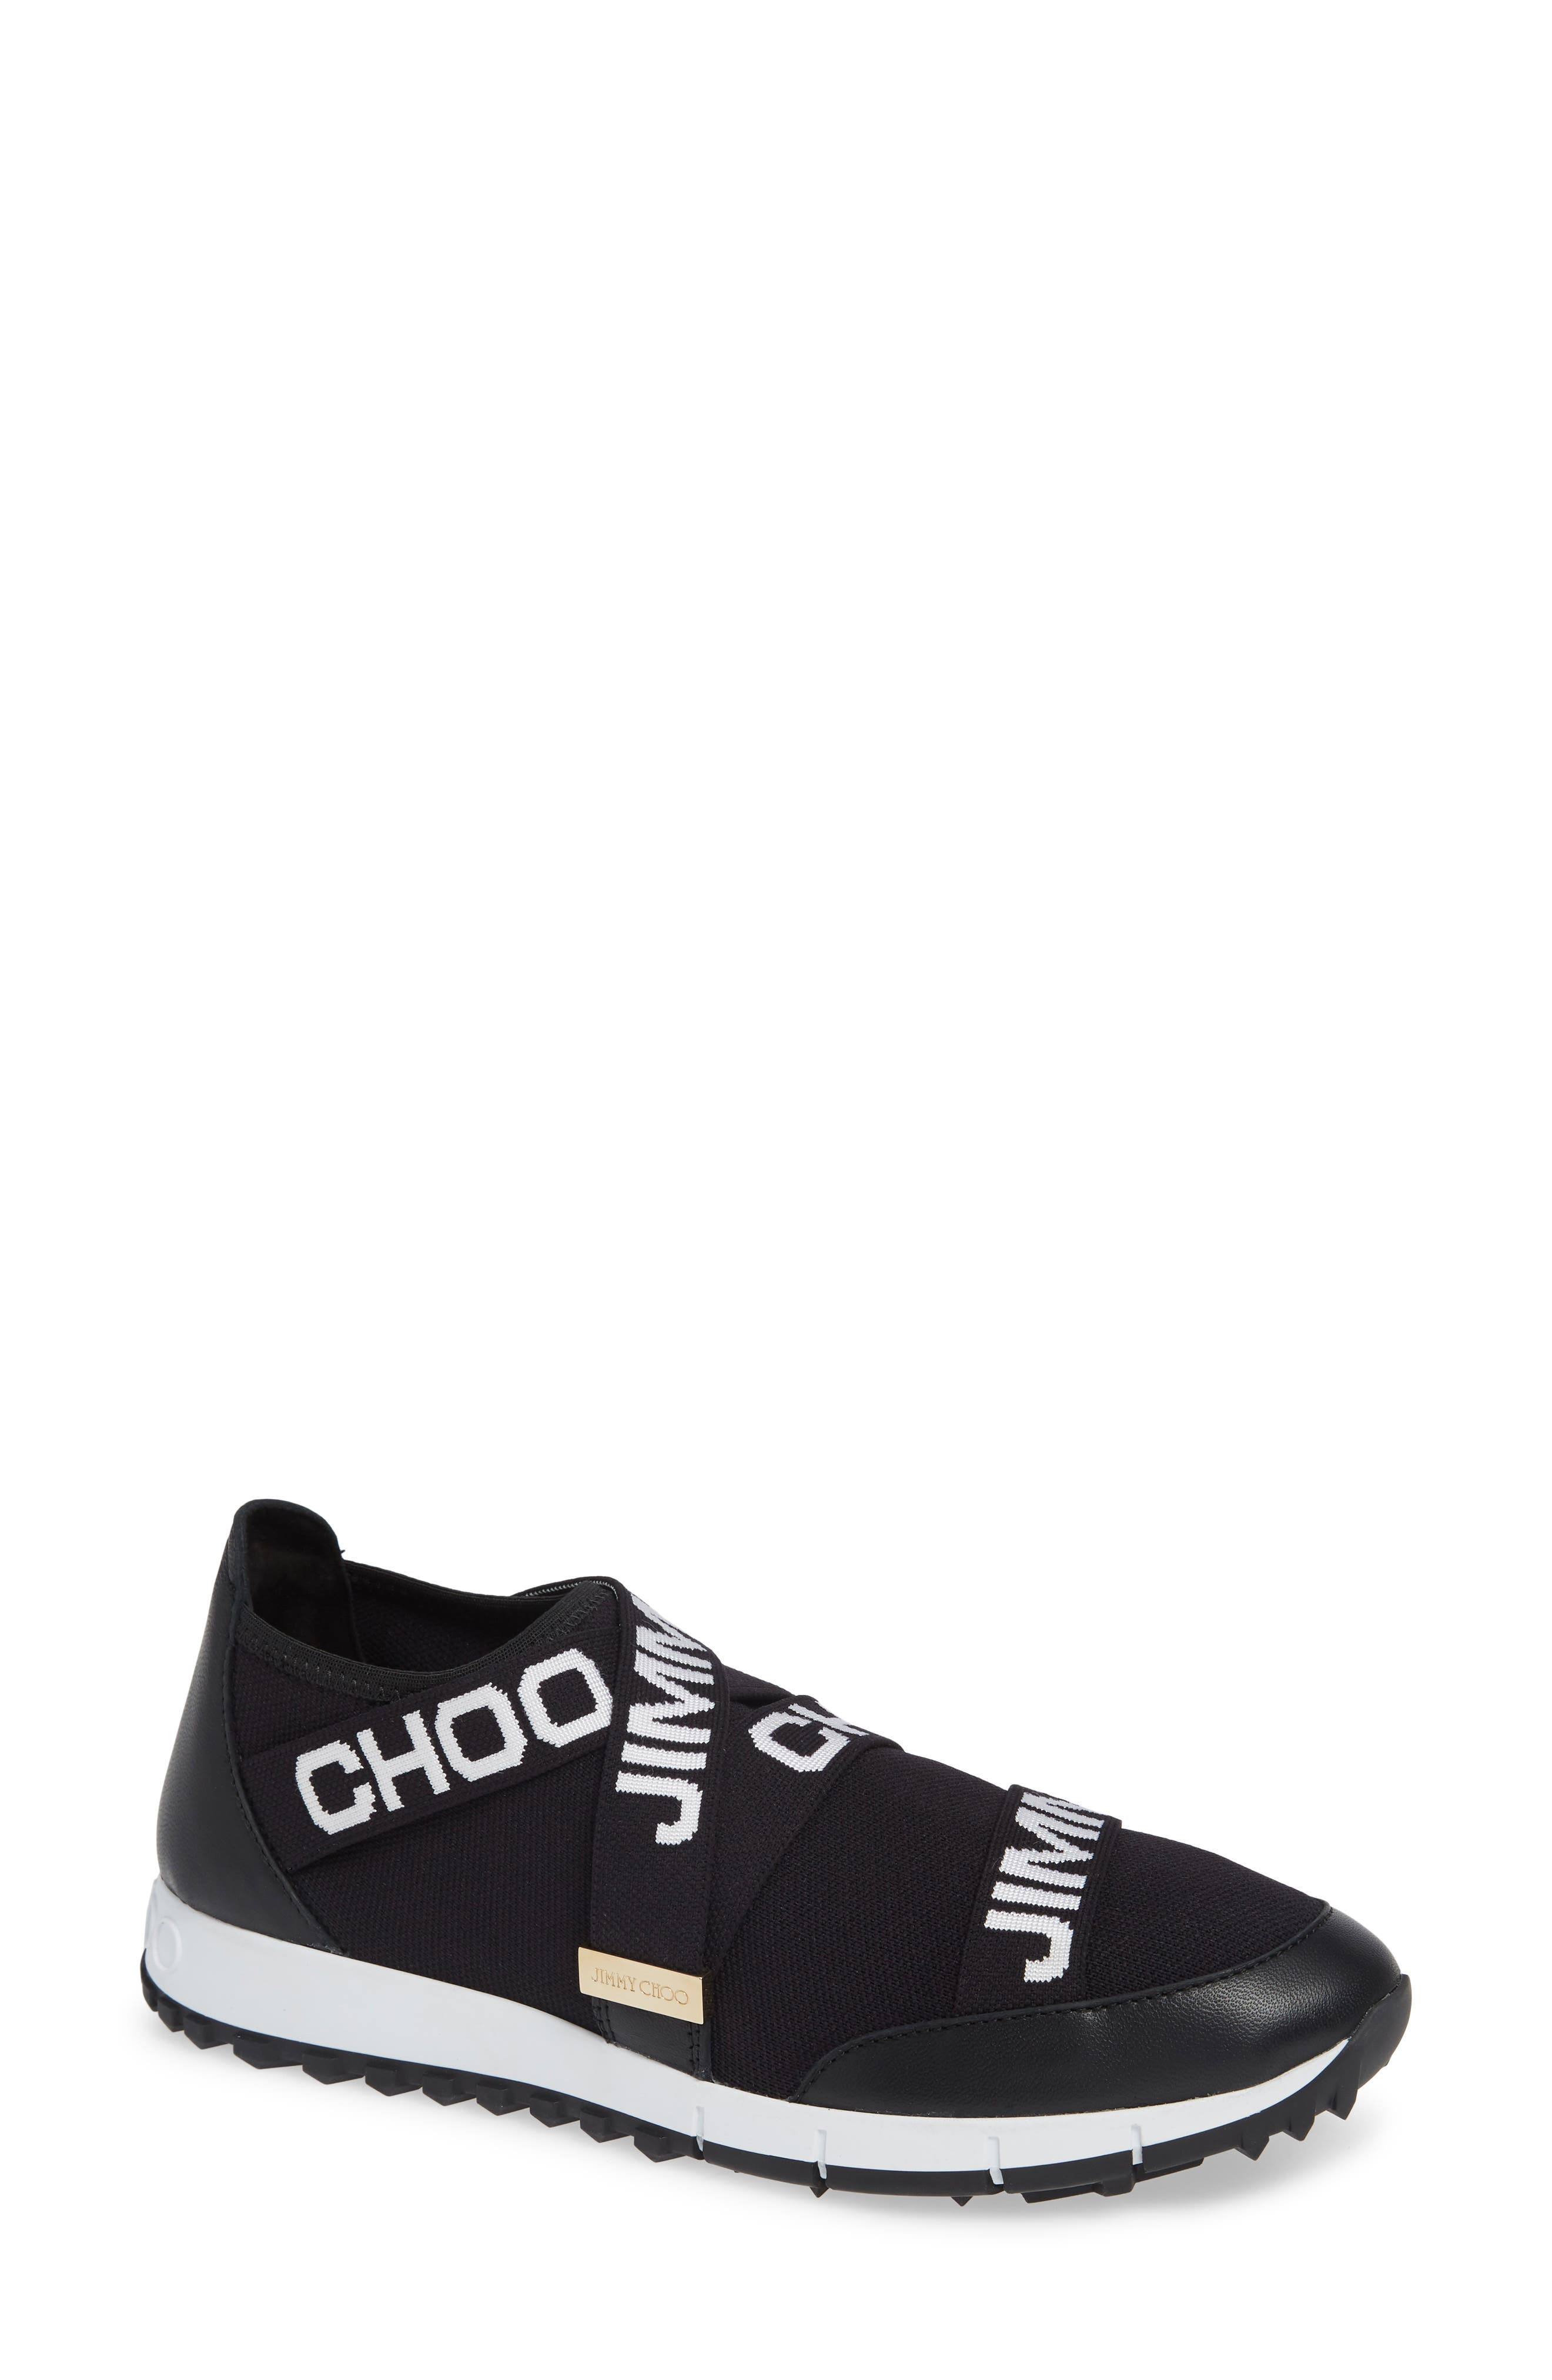 Toronto Logo Knit & Leather Sneakers in Black/ White